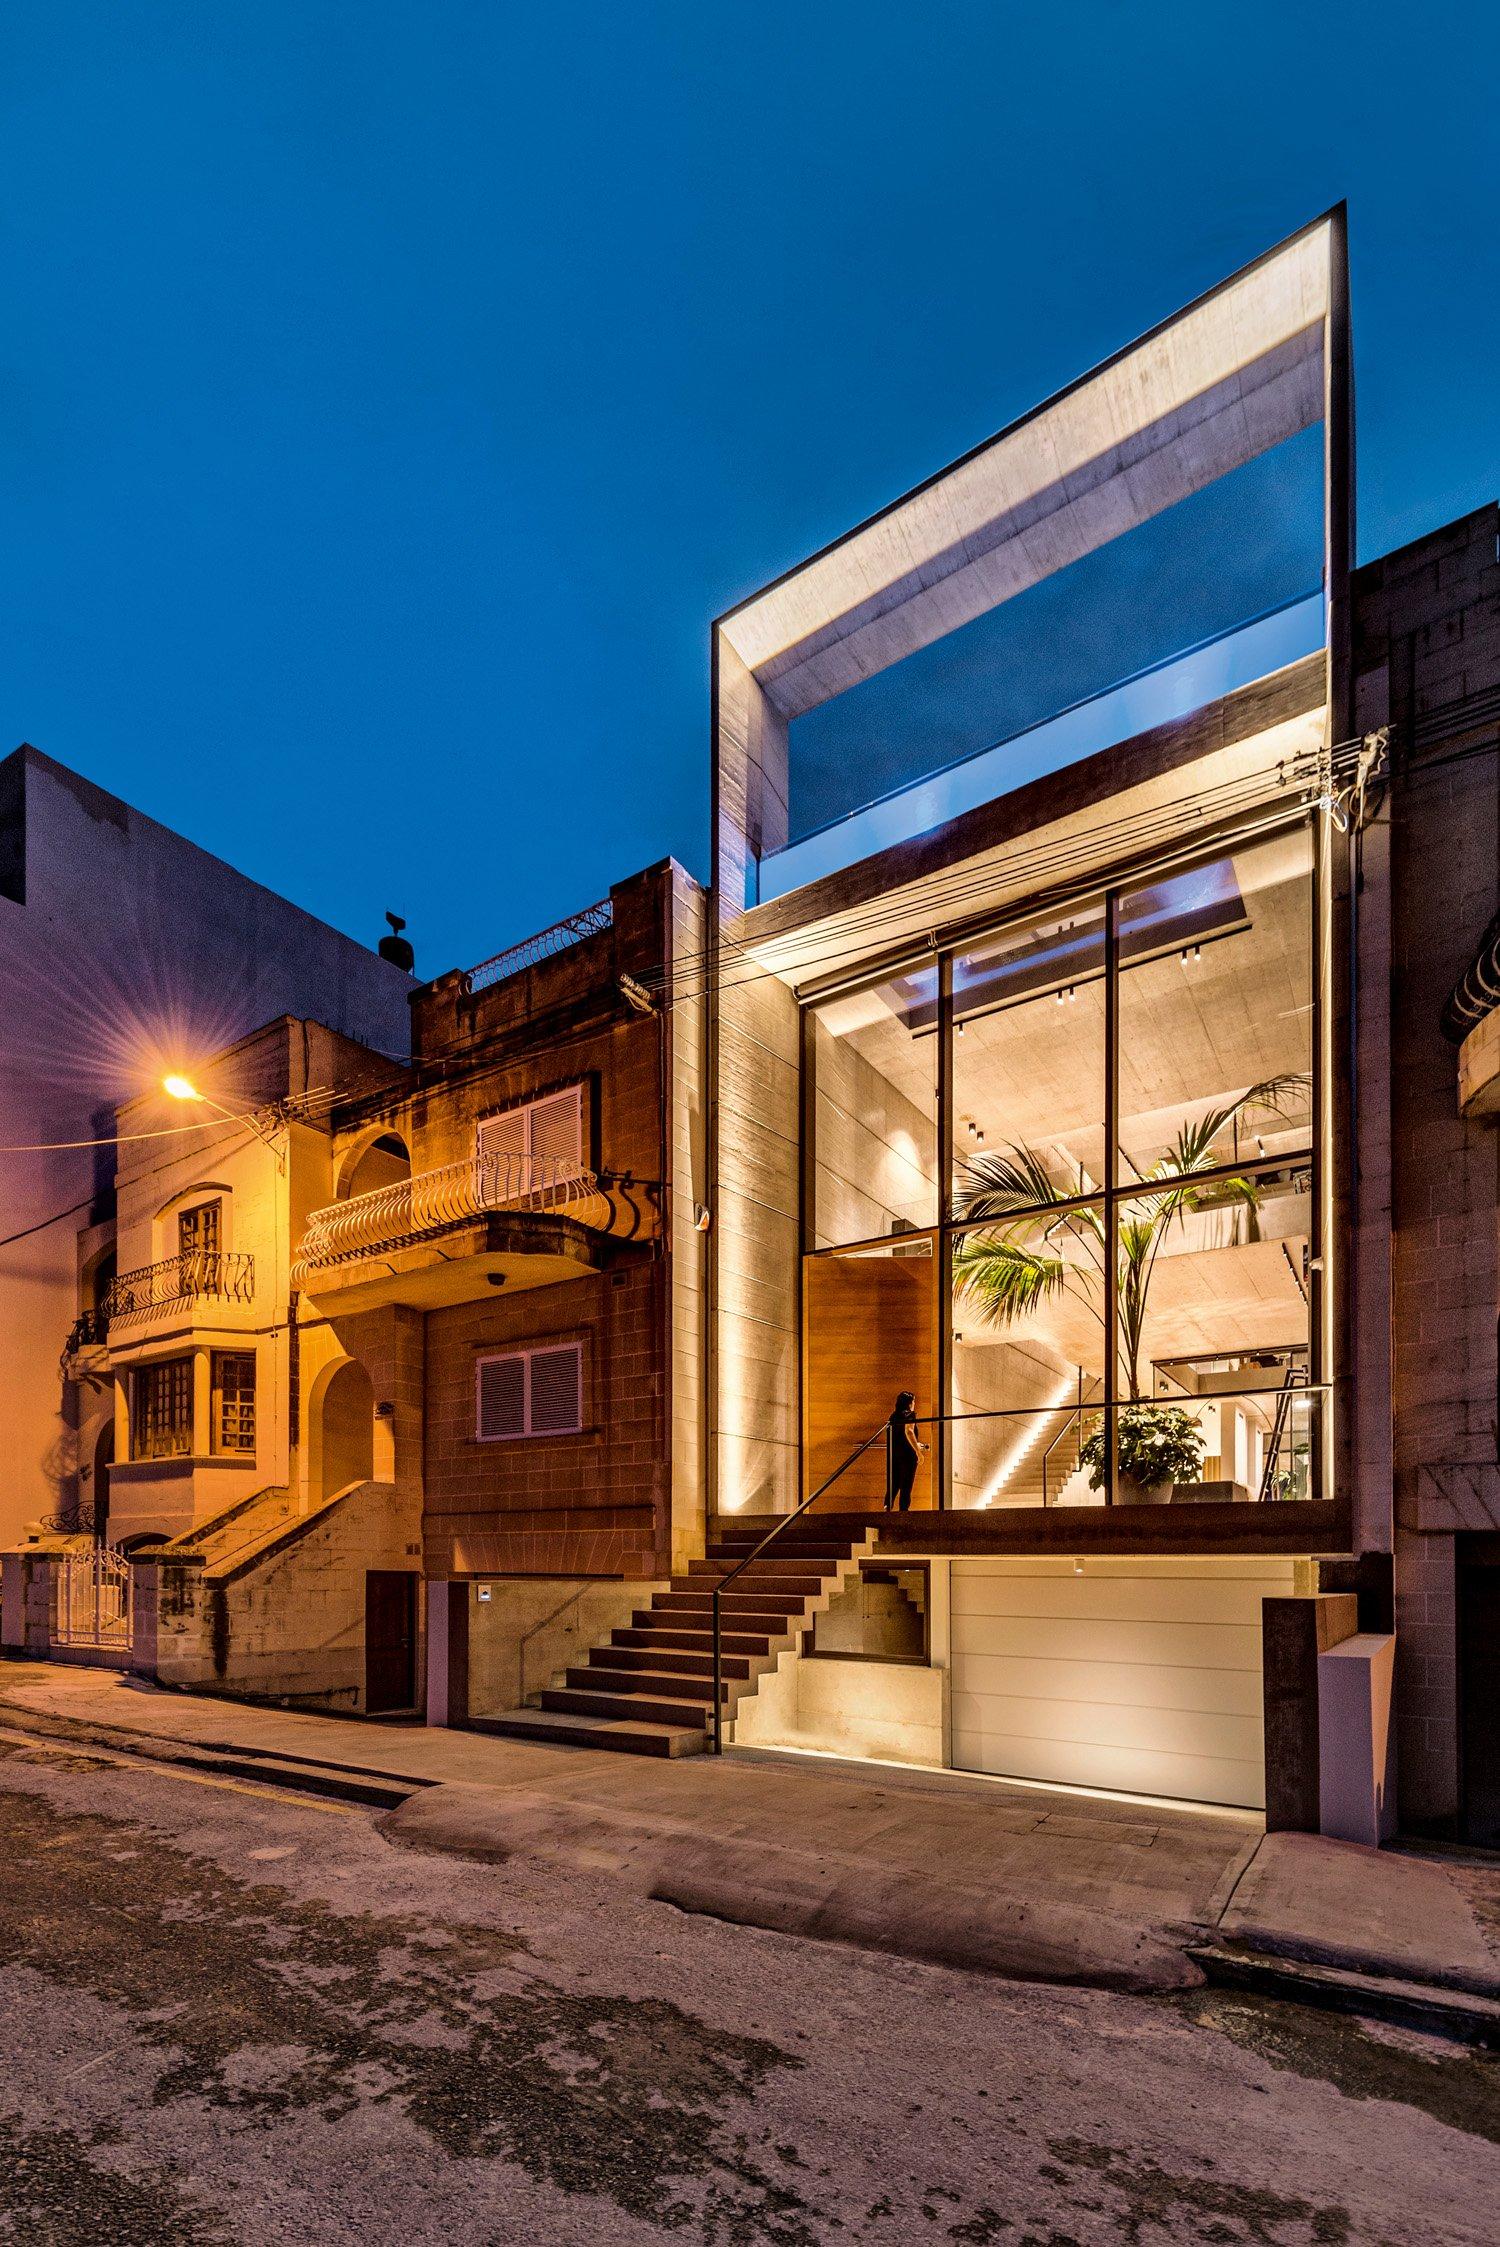 © Moreno Maggi, courtesy of Oikos - Architetture d'ingresso